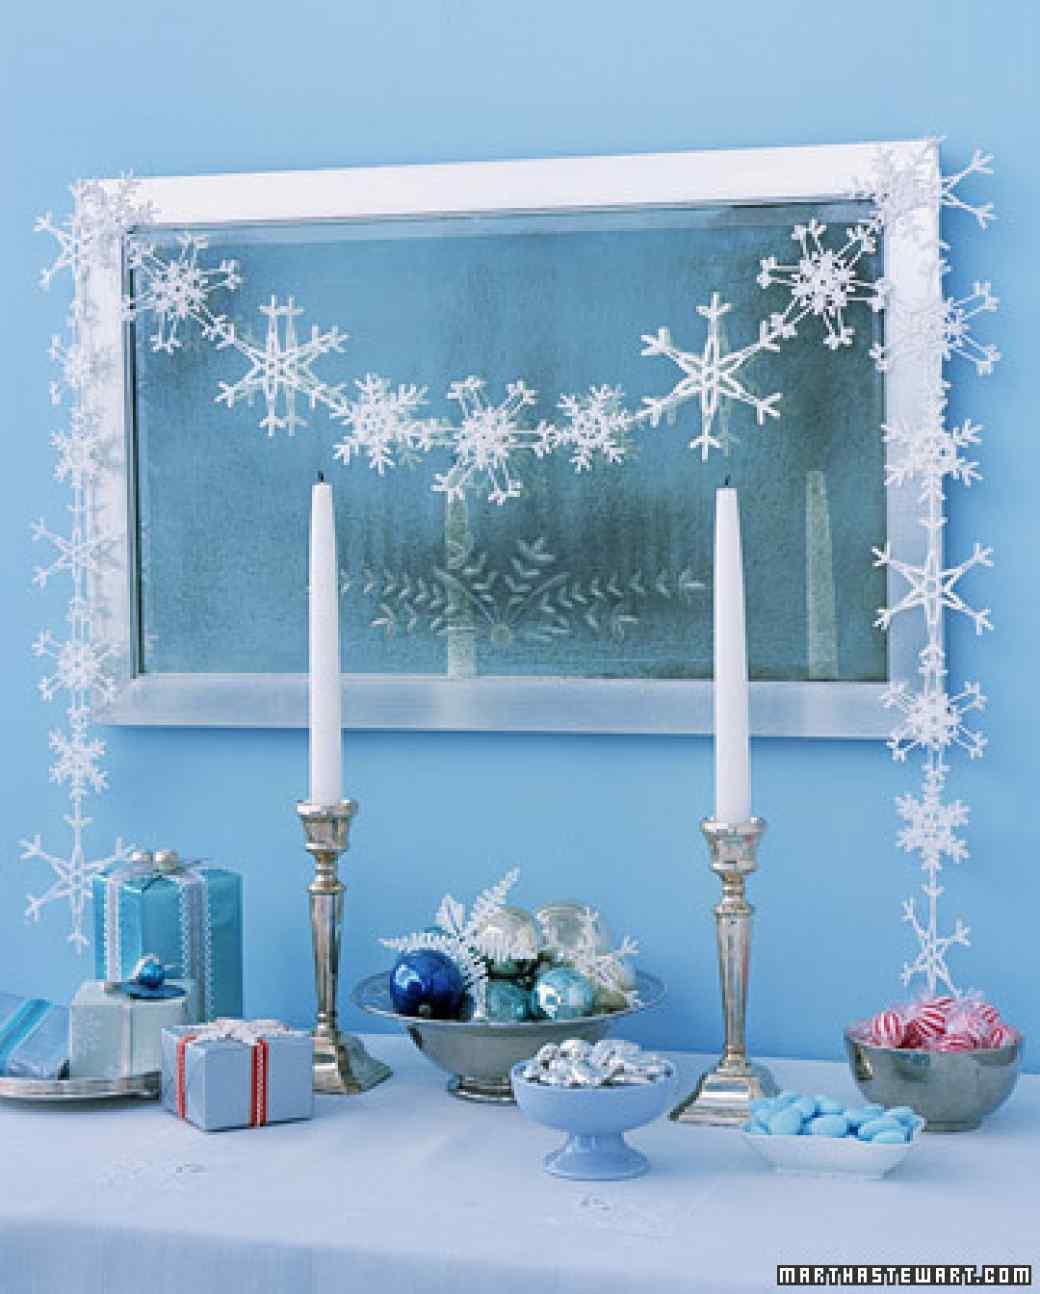 3 Inexpensive Christmas Garlands You Can Make Yourself ...